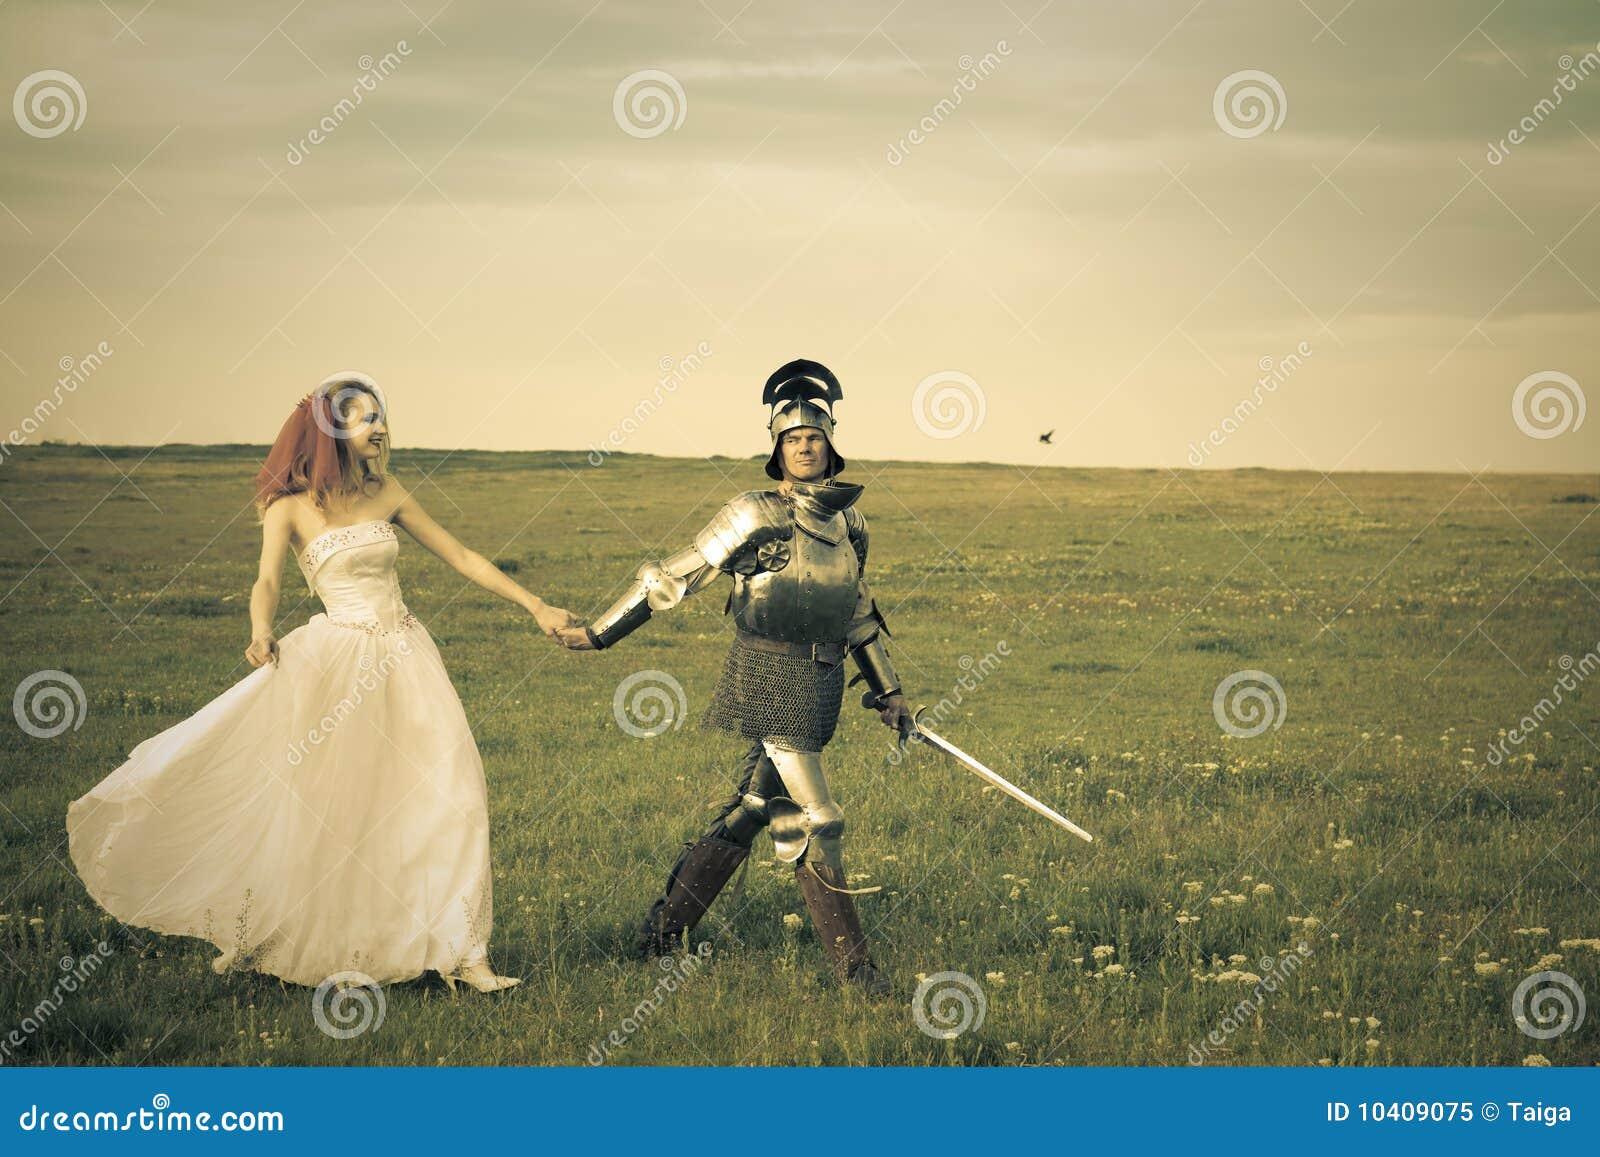 Princess Bride And Her Knight / Retro Style Stock Image ...